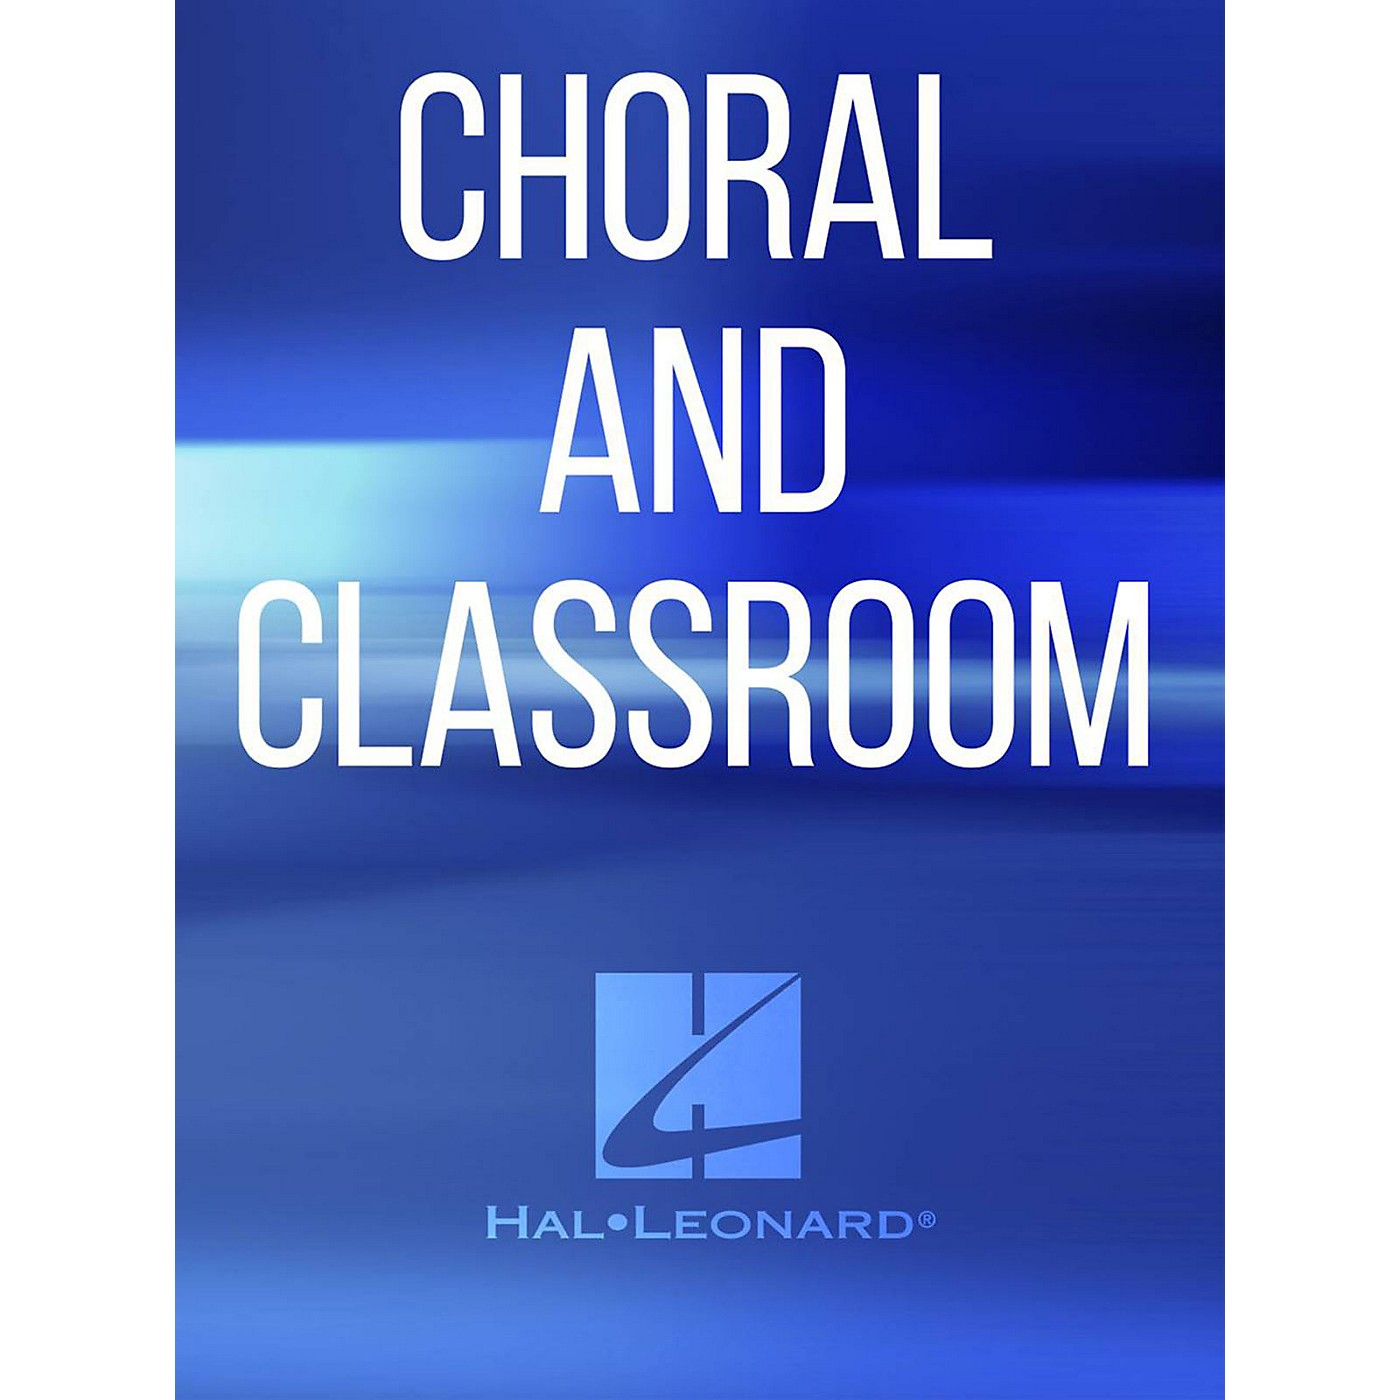 Hal Leonard Maybe I'm Amazed (from Joyful Noise) SATB by Paul McCartney Arranged by Mac Huff thumbnail